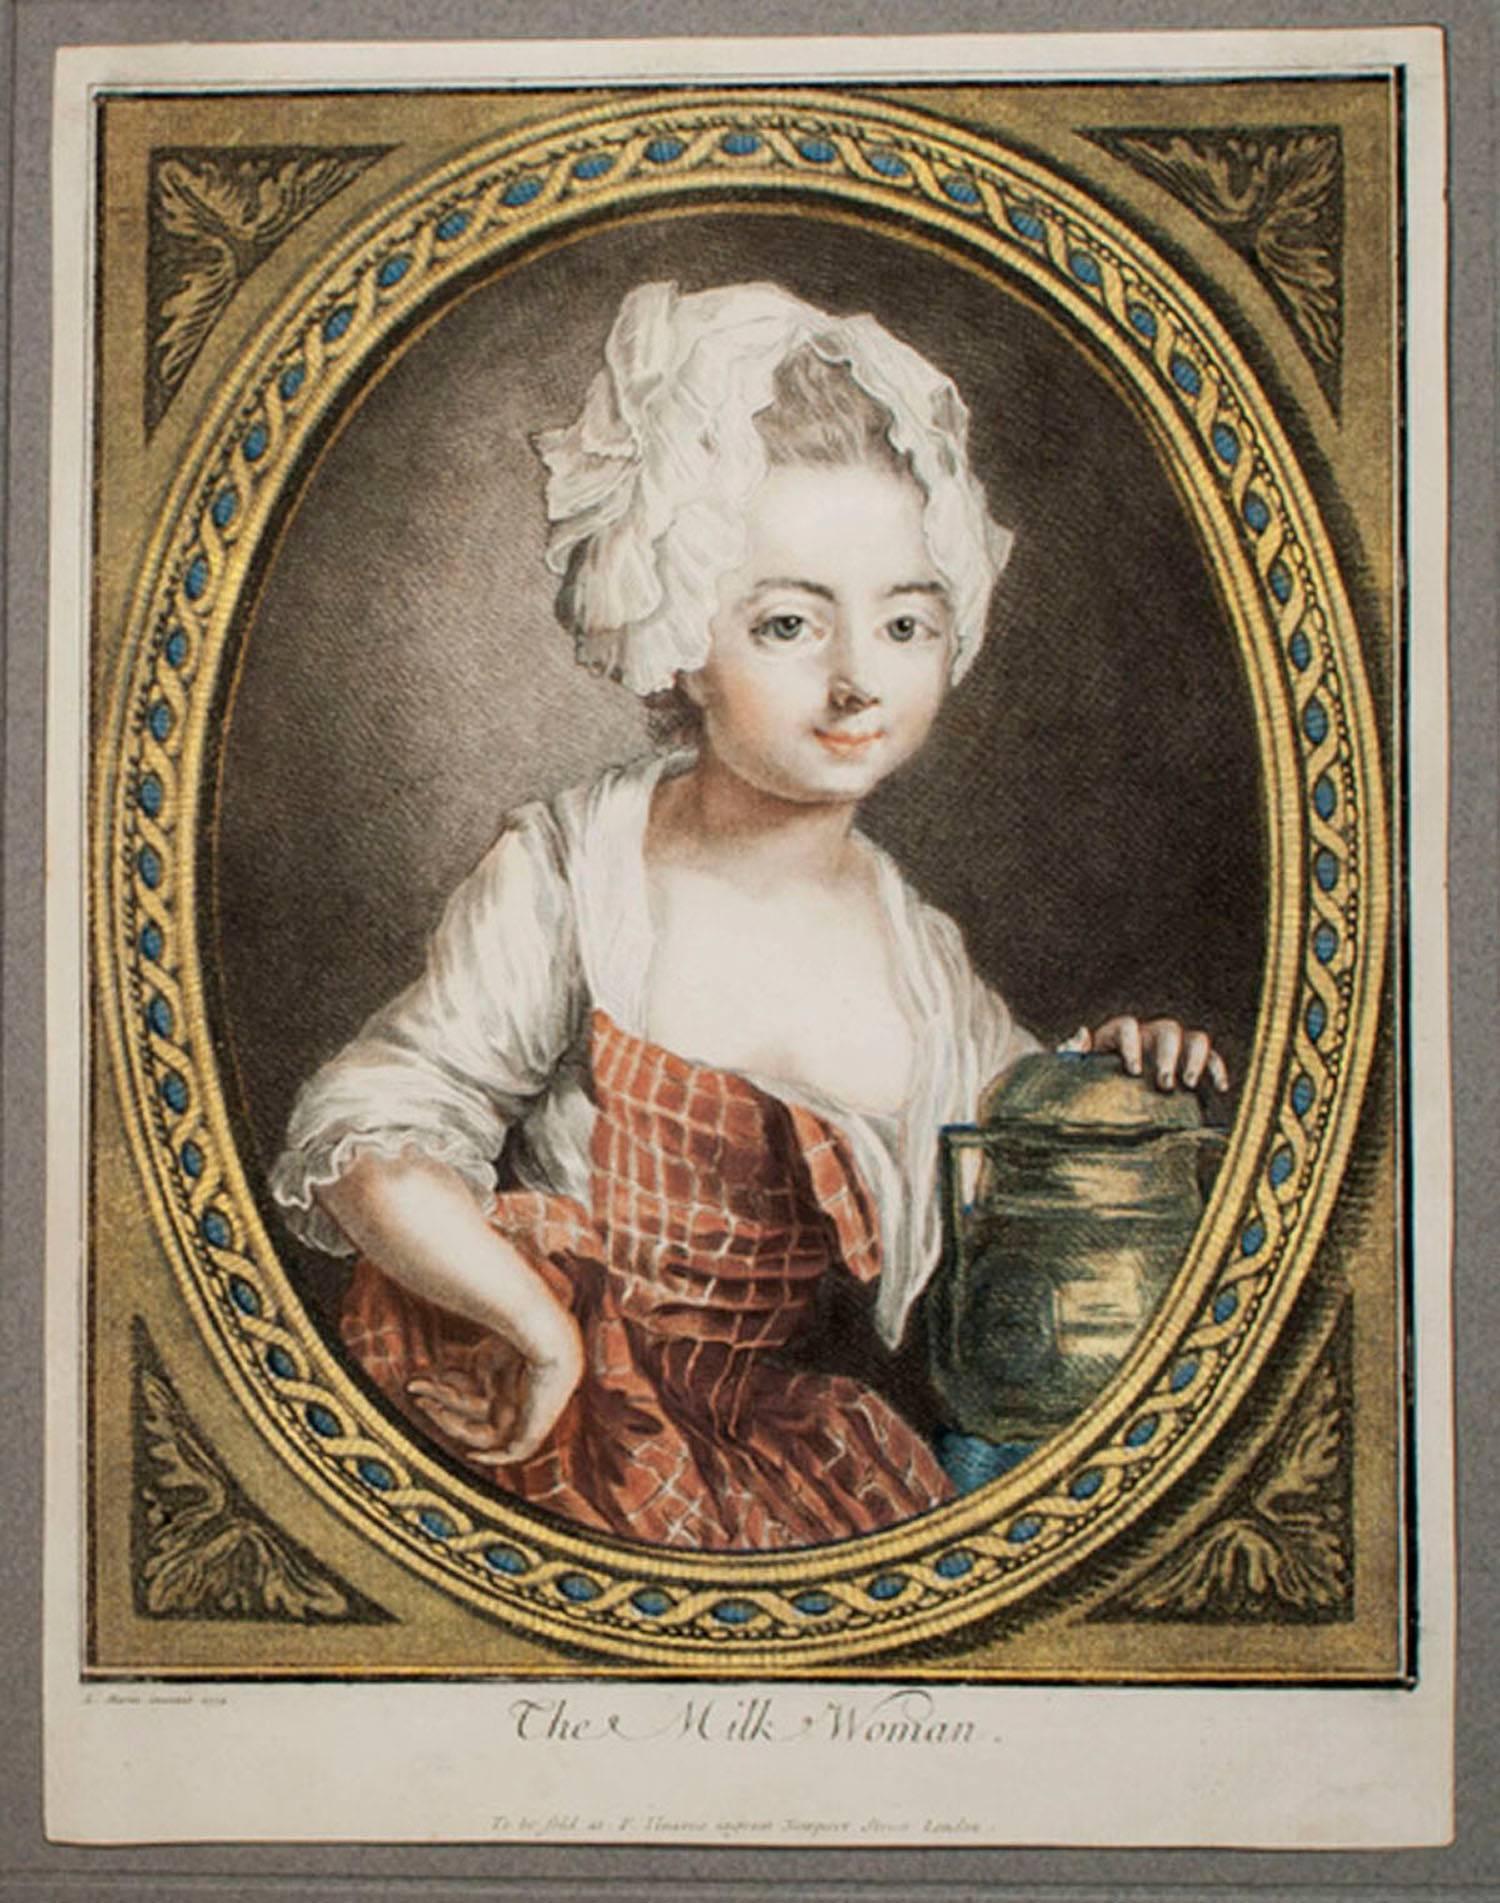 The Milk Woman